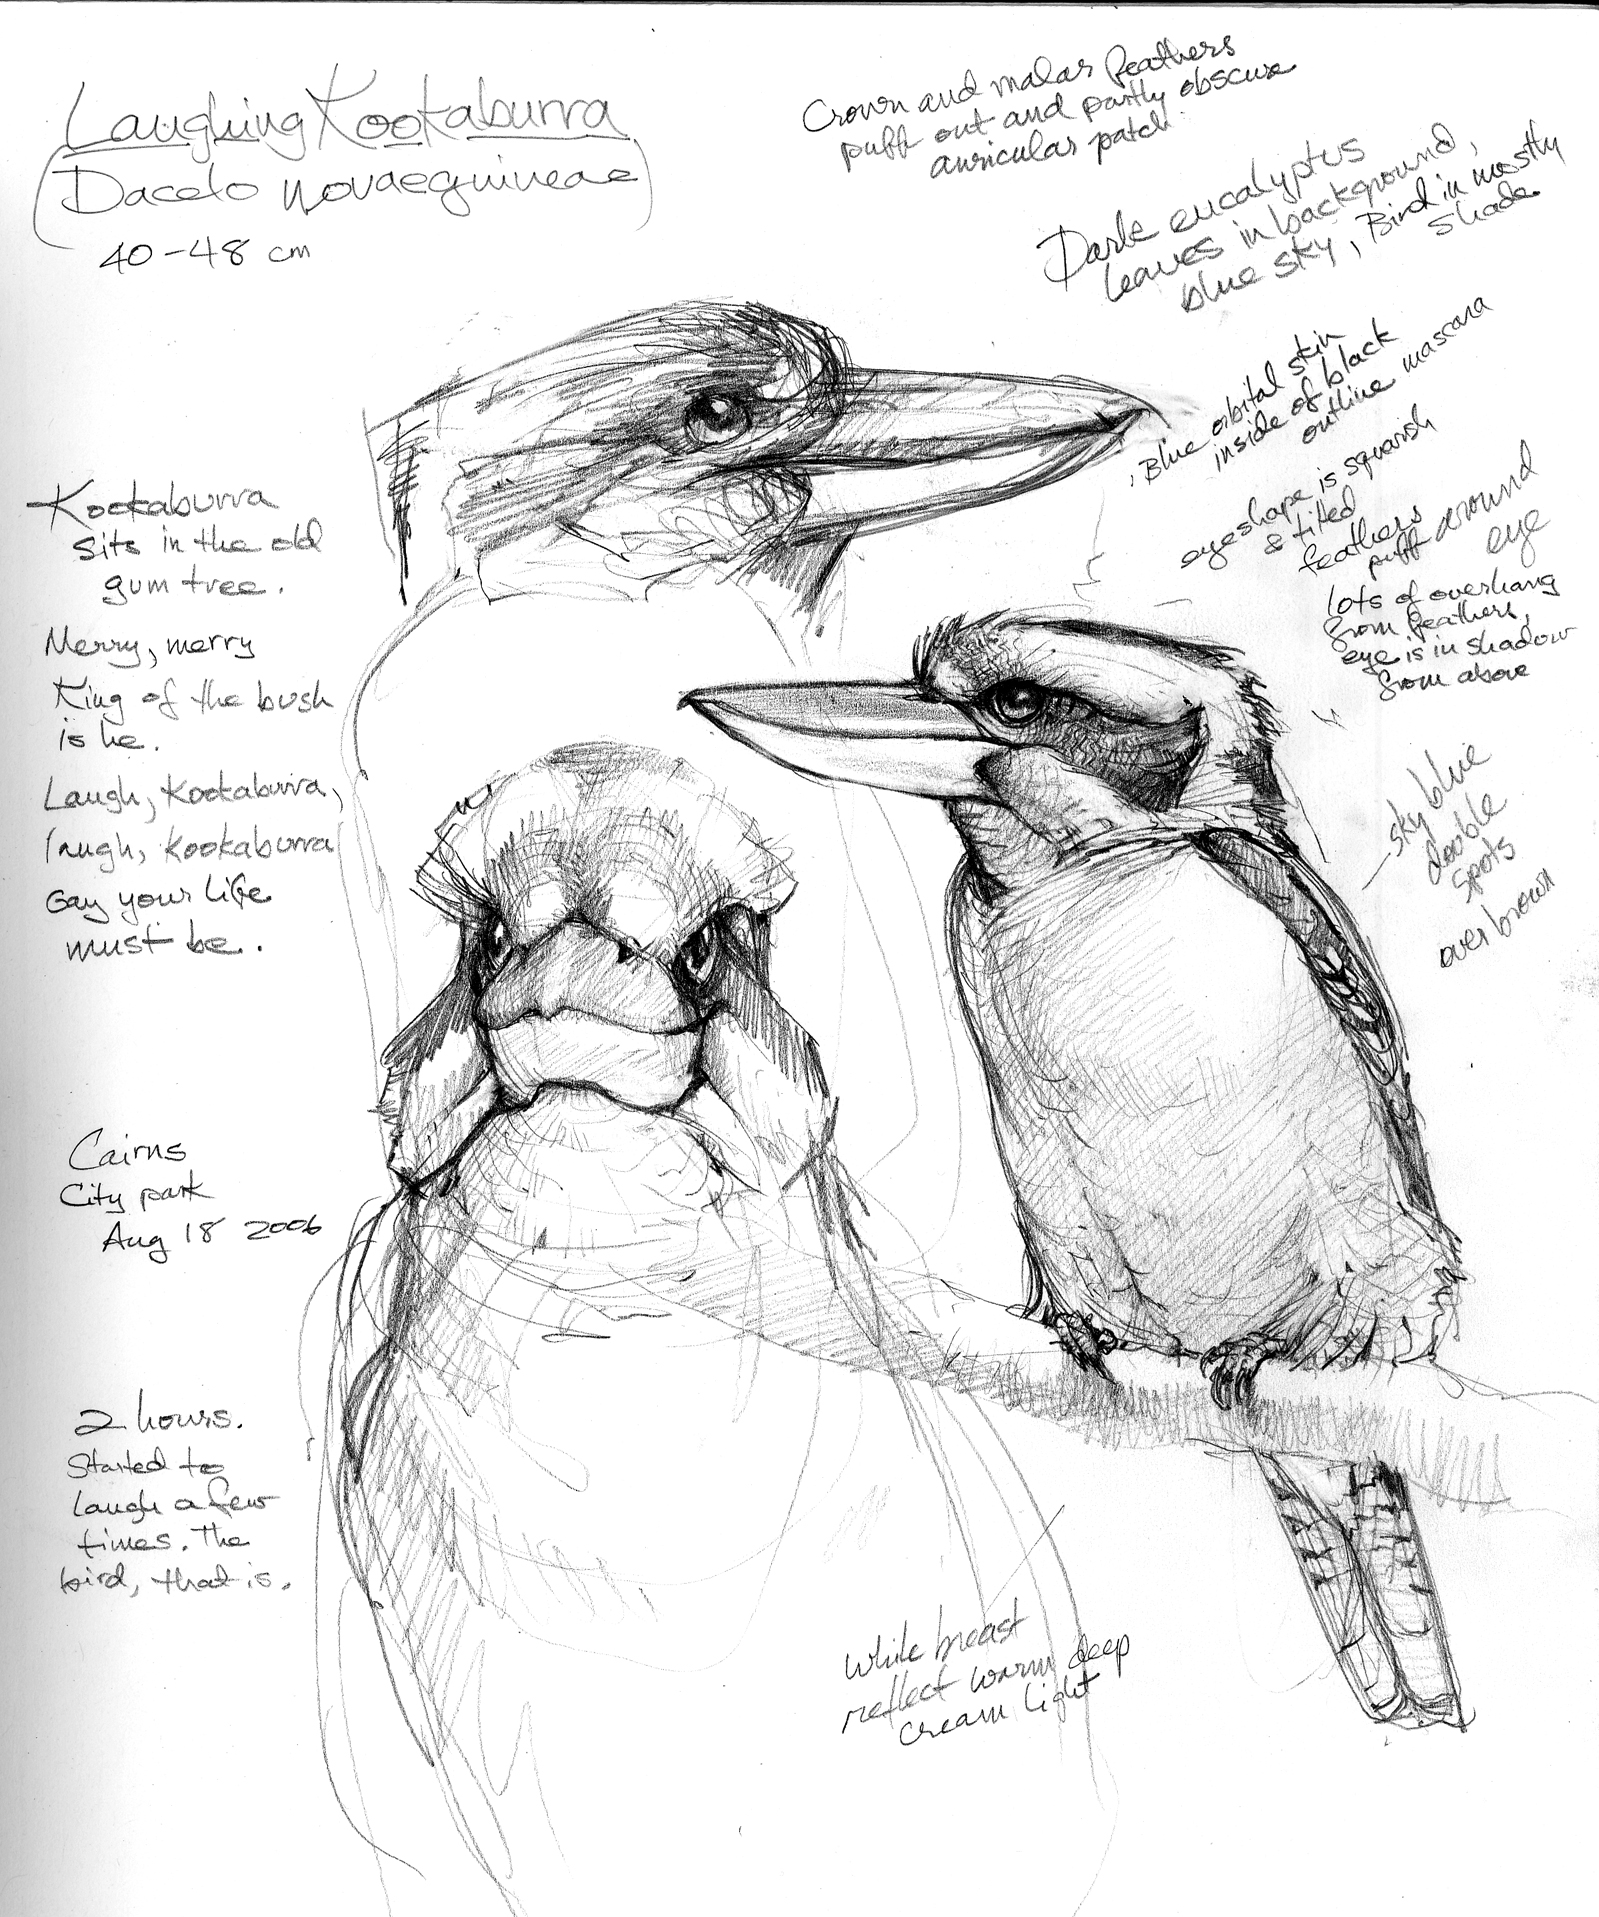 Australia Sketchbook